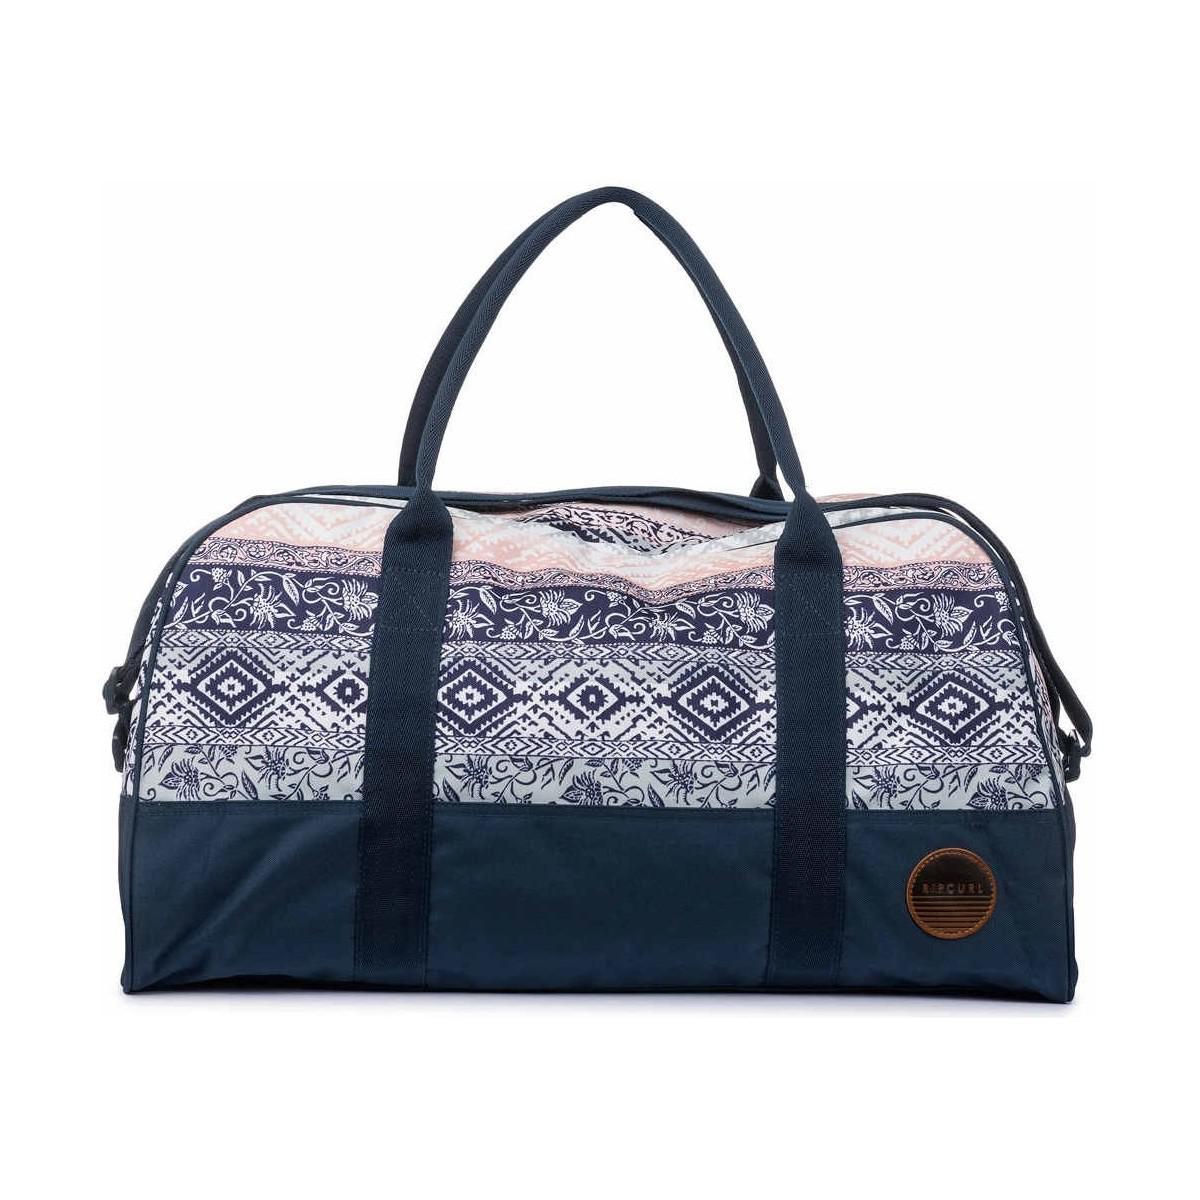 Rip Curl Duffle Hi Desert Women s Travel Bag In Multicolour in Blue ... 776ca399c9